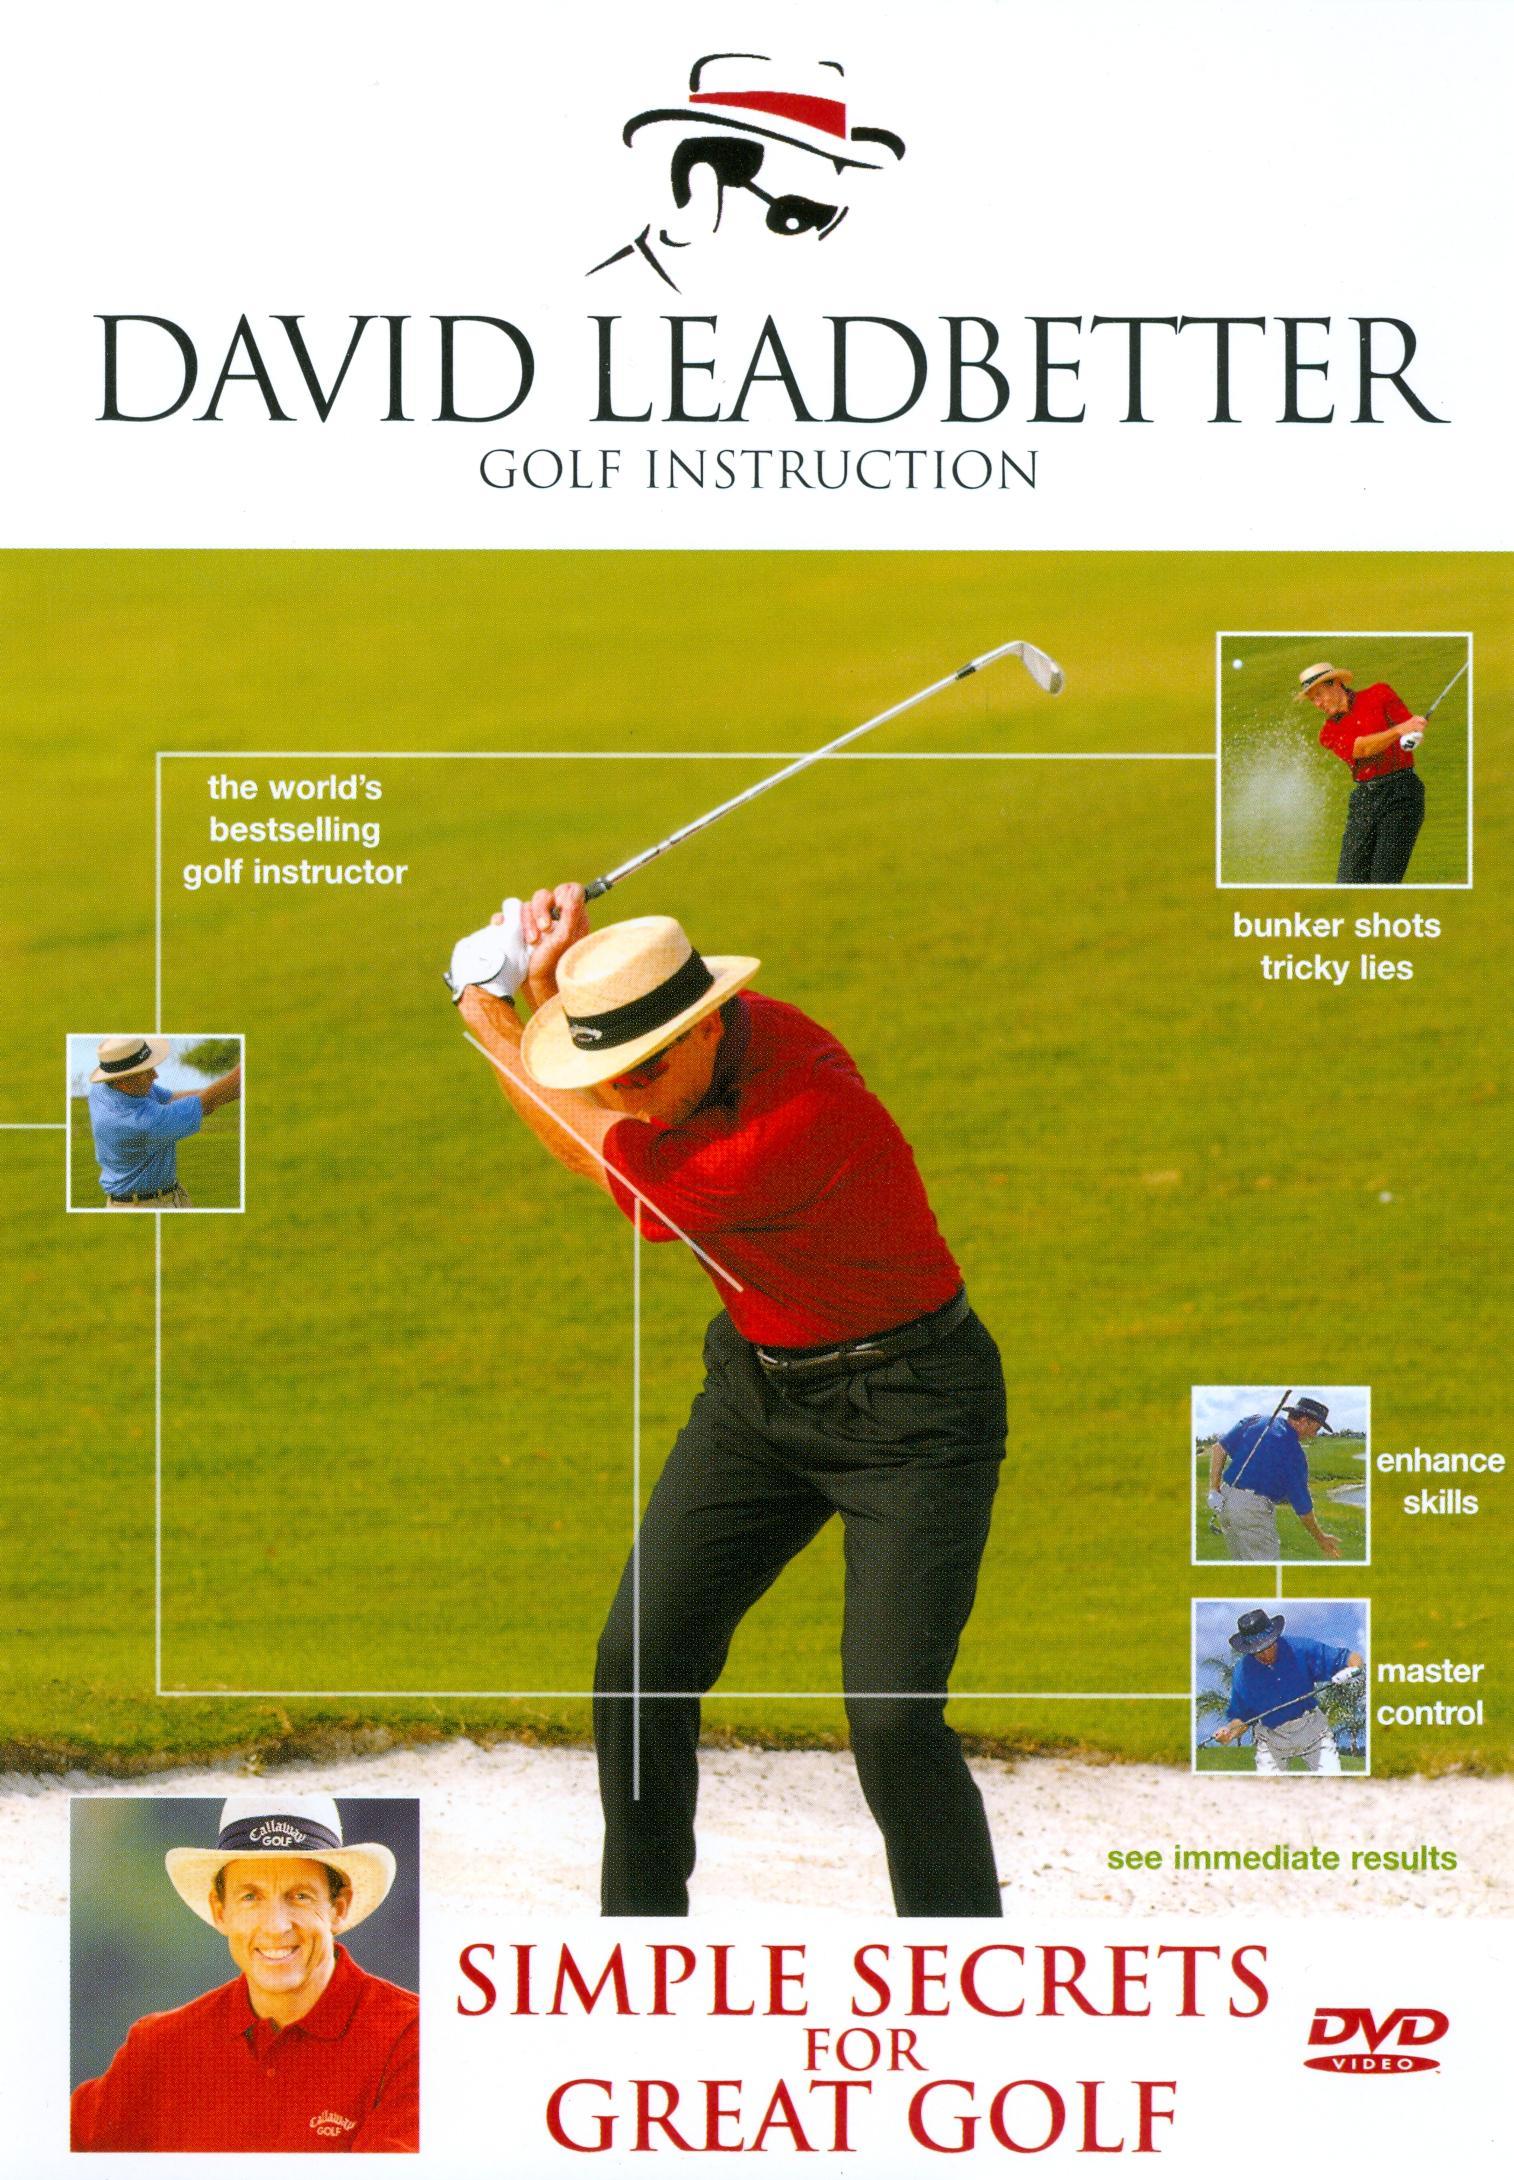 David Leadbetter Golf Instruction: Simple Secrets for Great Golf